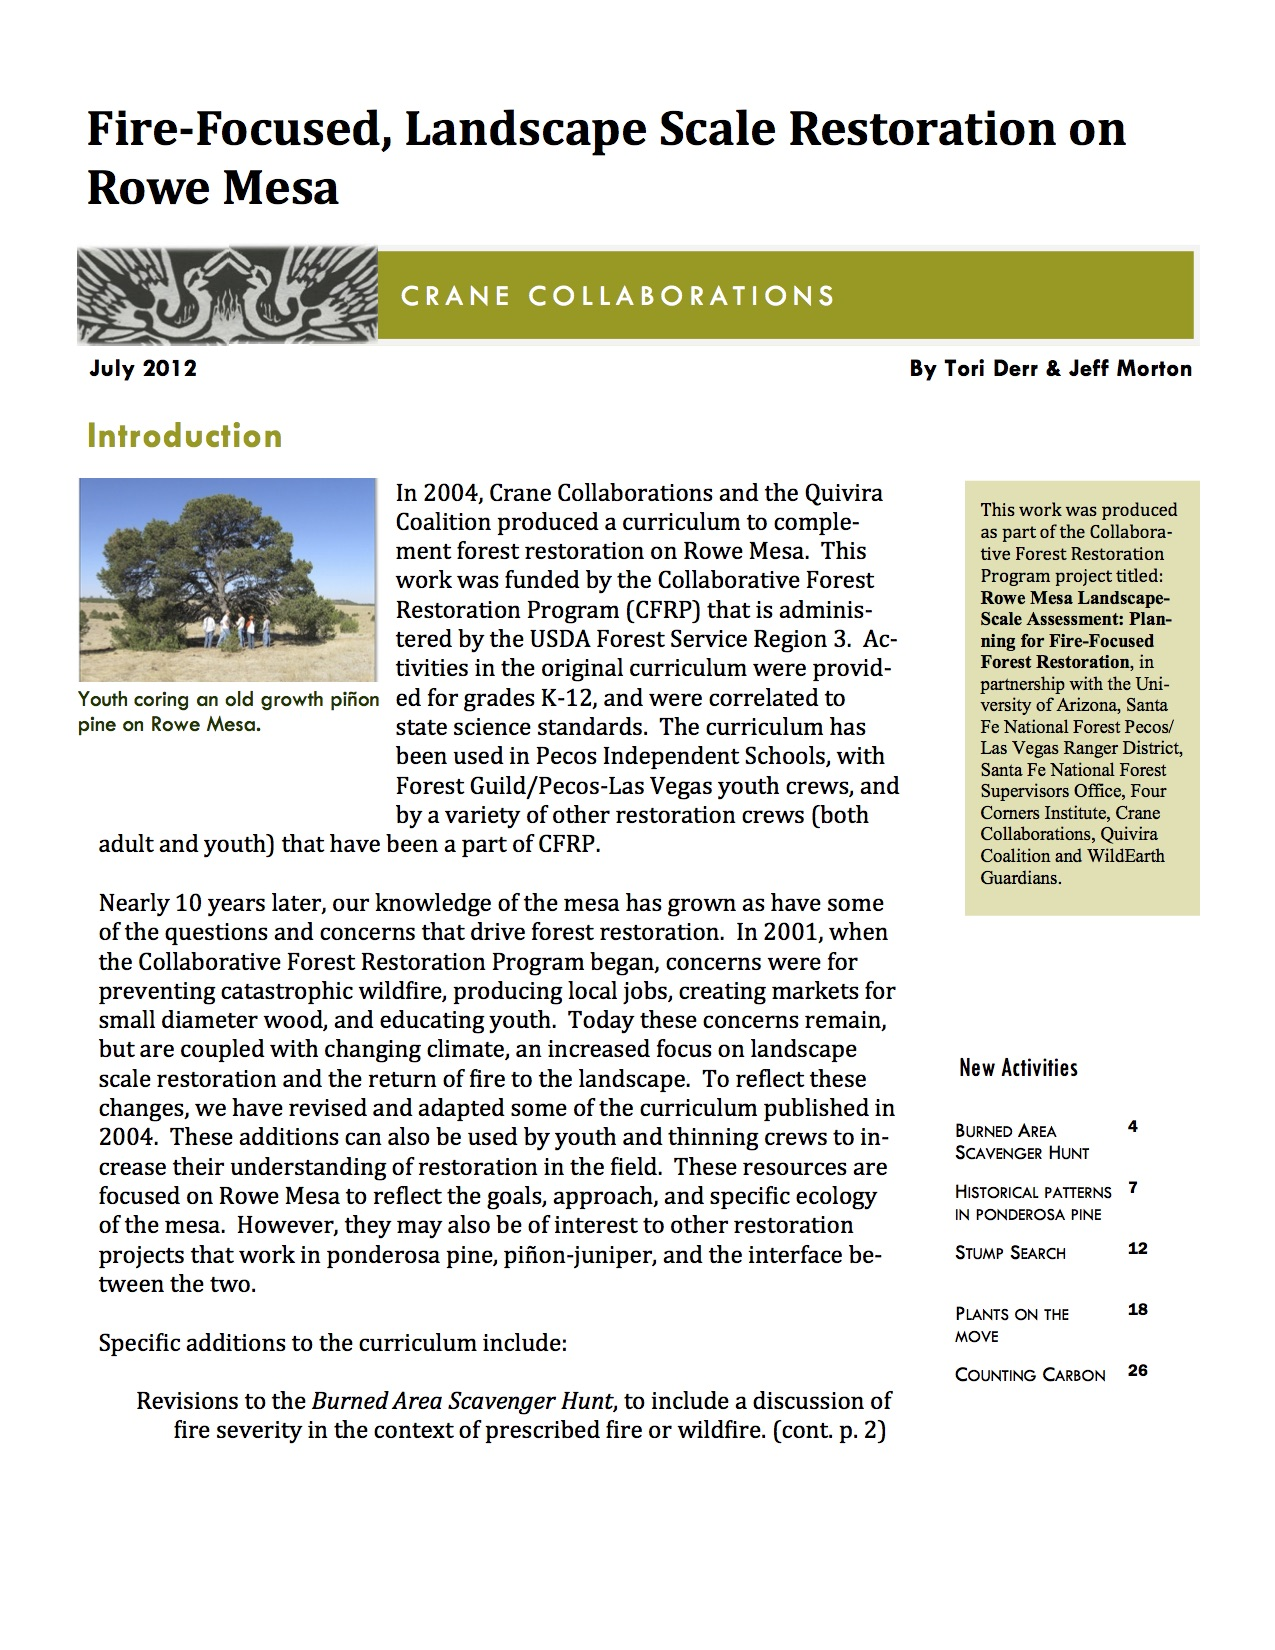 Fire-Focused, Landscape Scale Restoration on Rowe Mesa -